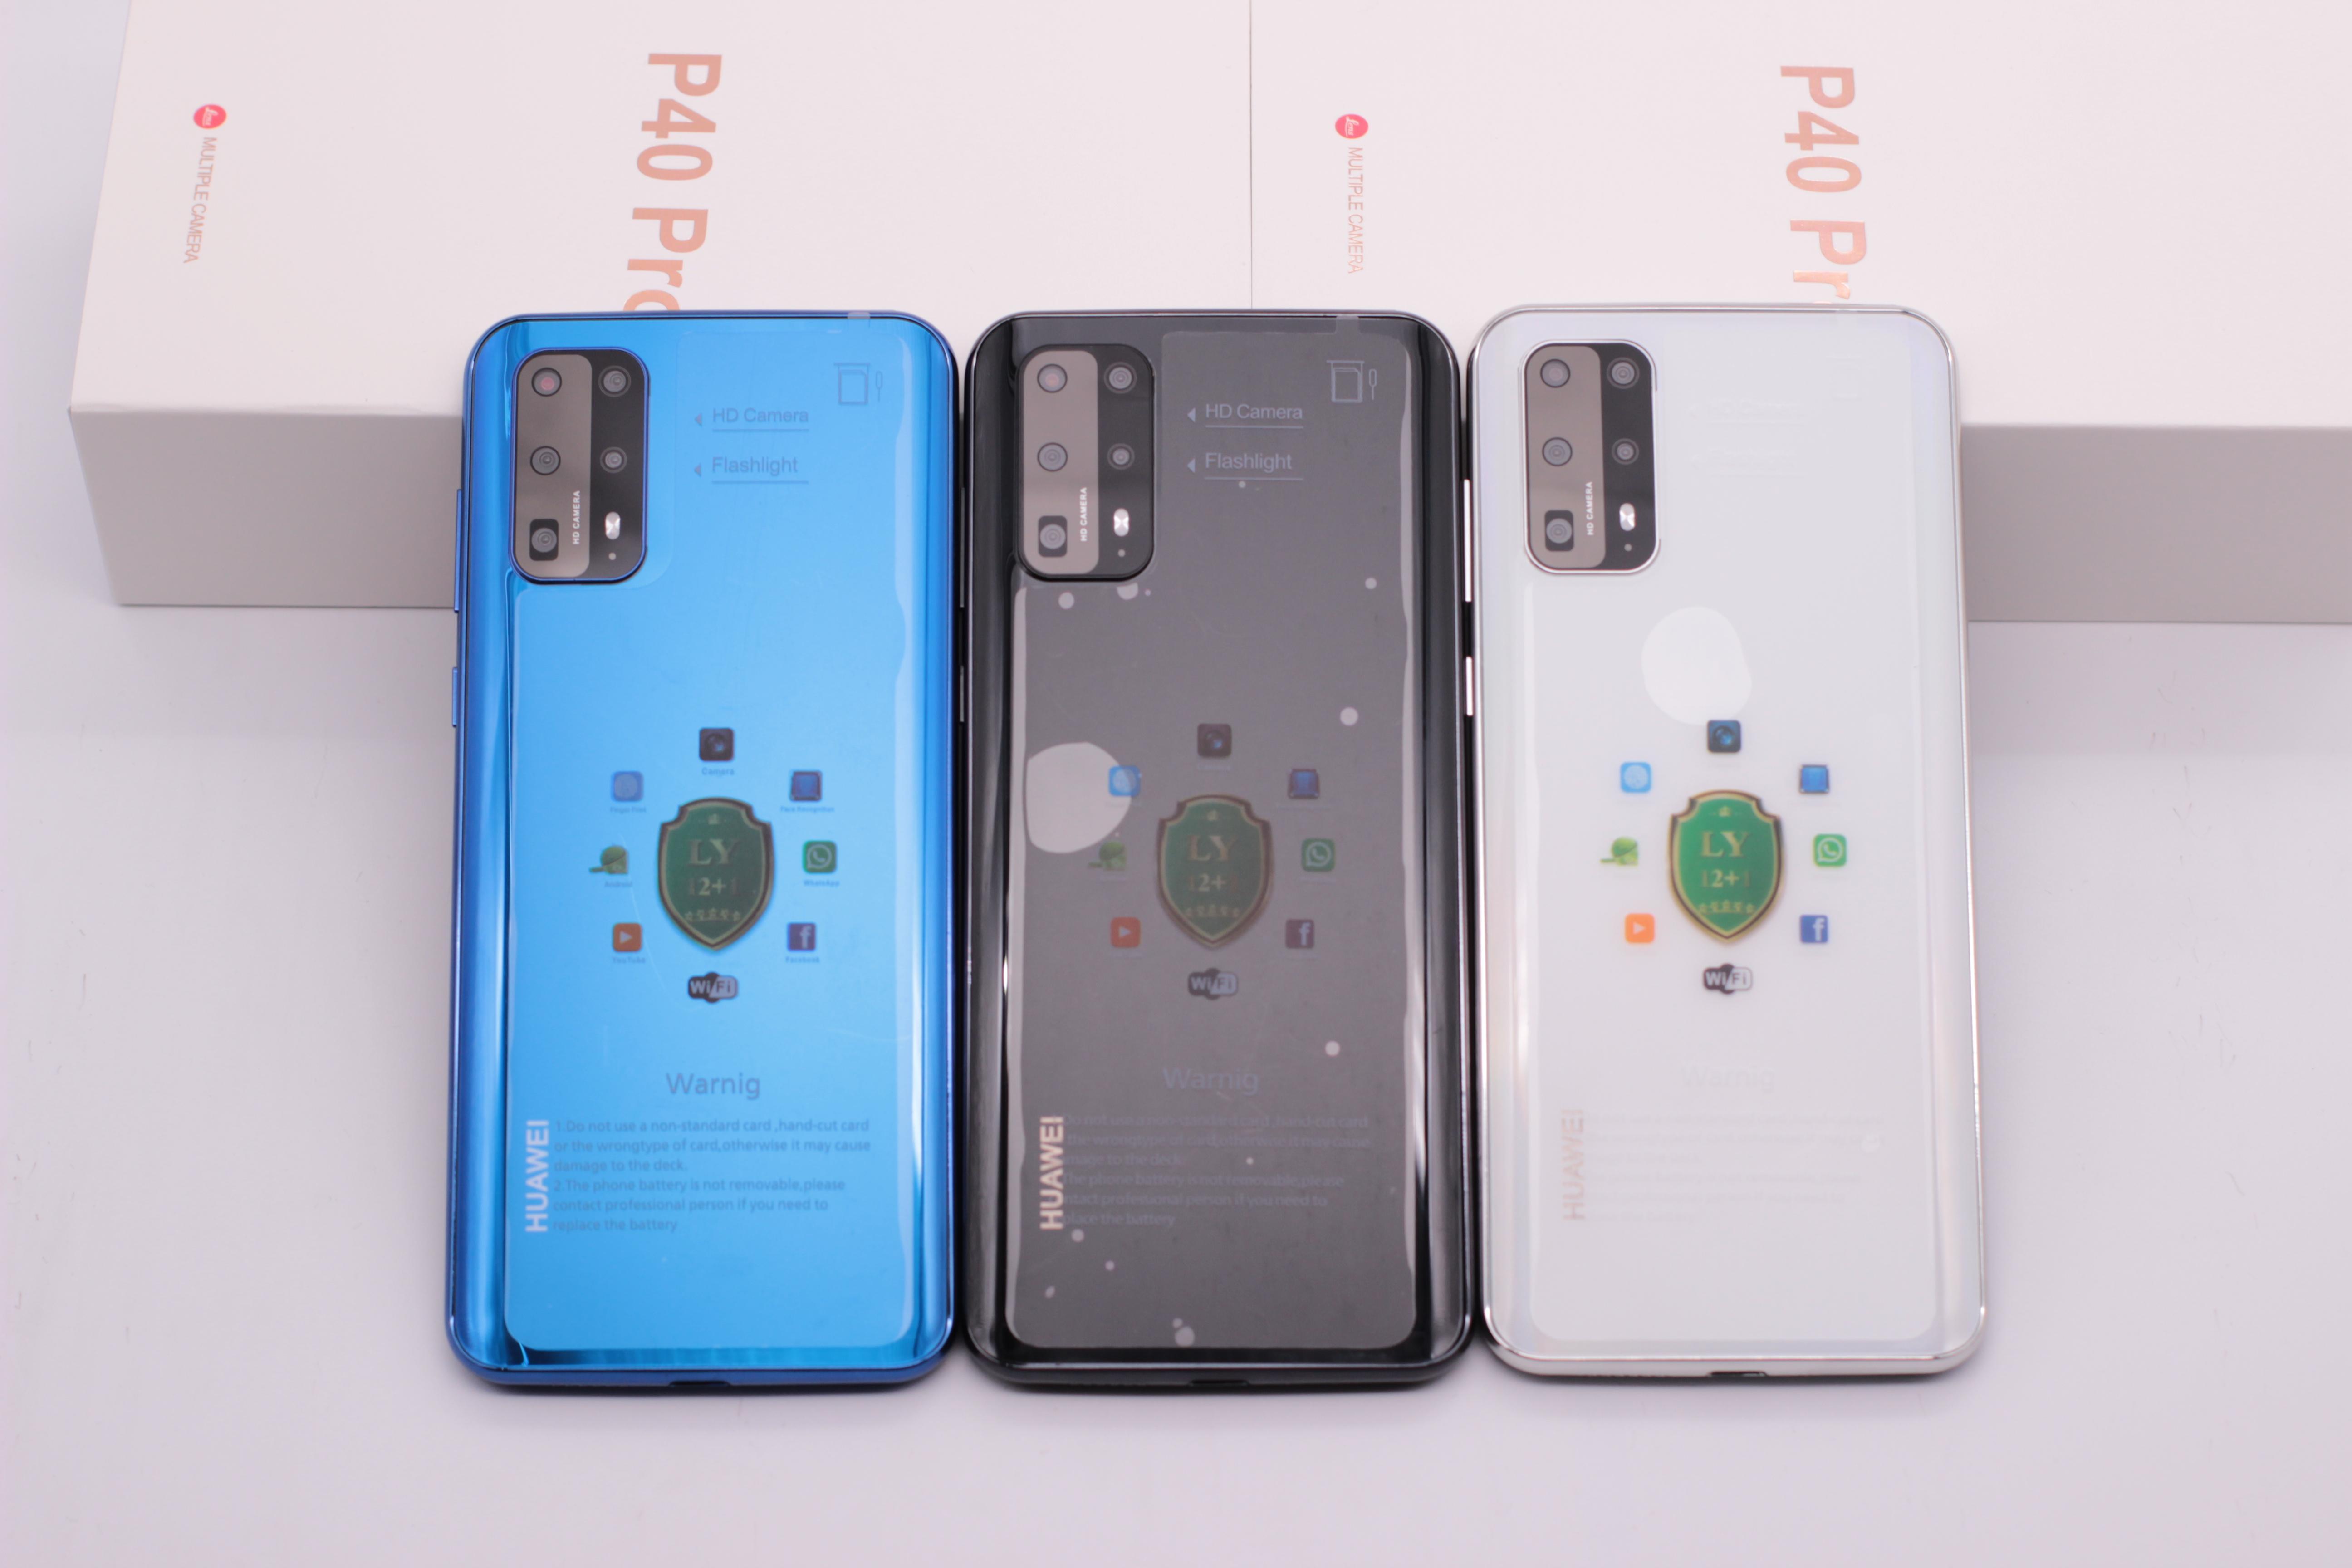 Goophone P40 프로 휴대 전화 6.58inch 스마트 폰의 3G 휴대 전화 WCDMA 쿼드 코어 MTK6580 1기가바이트 8기가바이트 GPS 표시 가짜 4G LTE